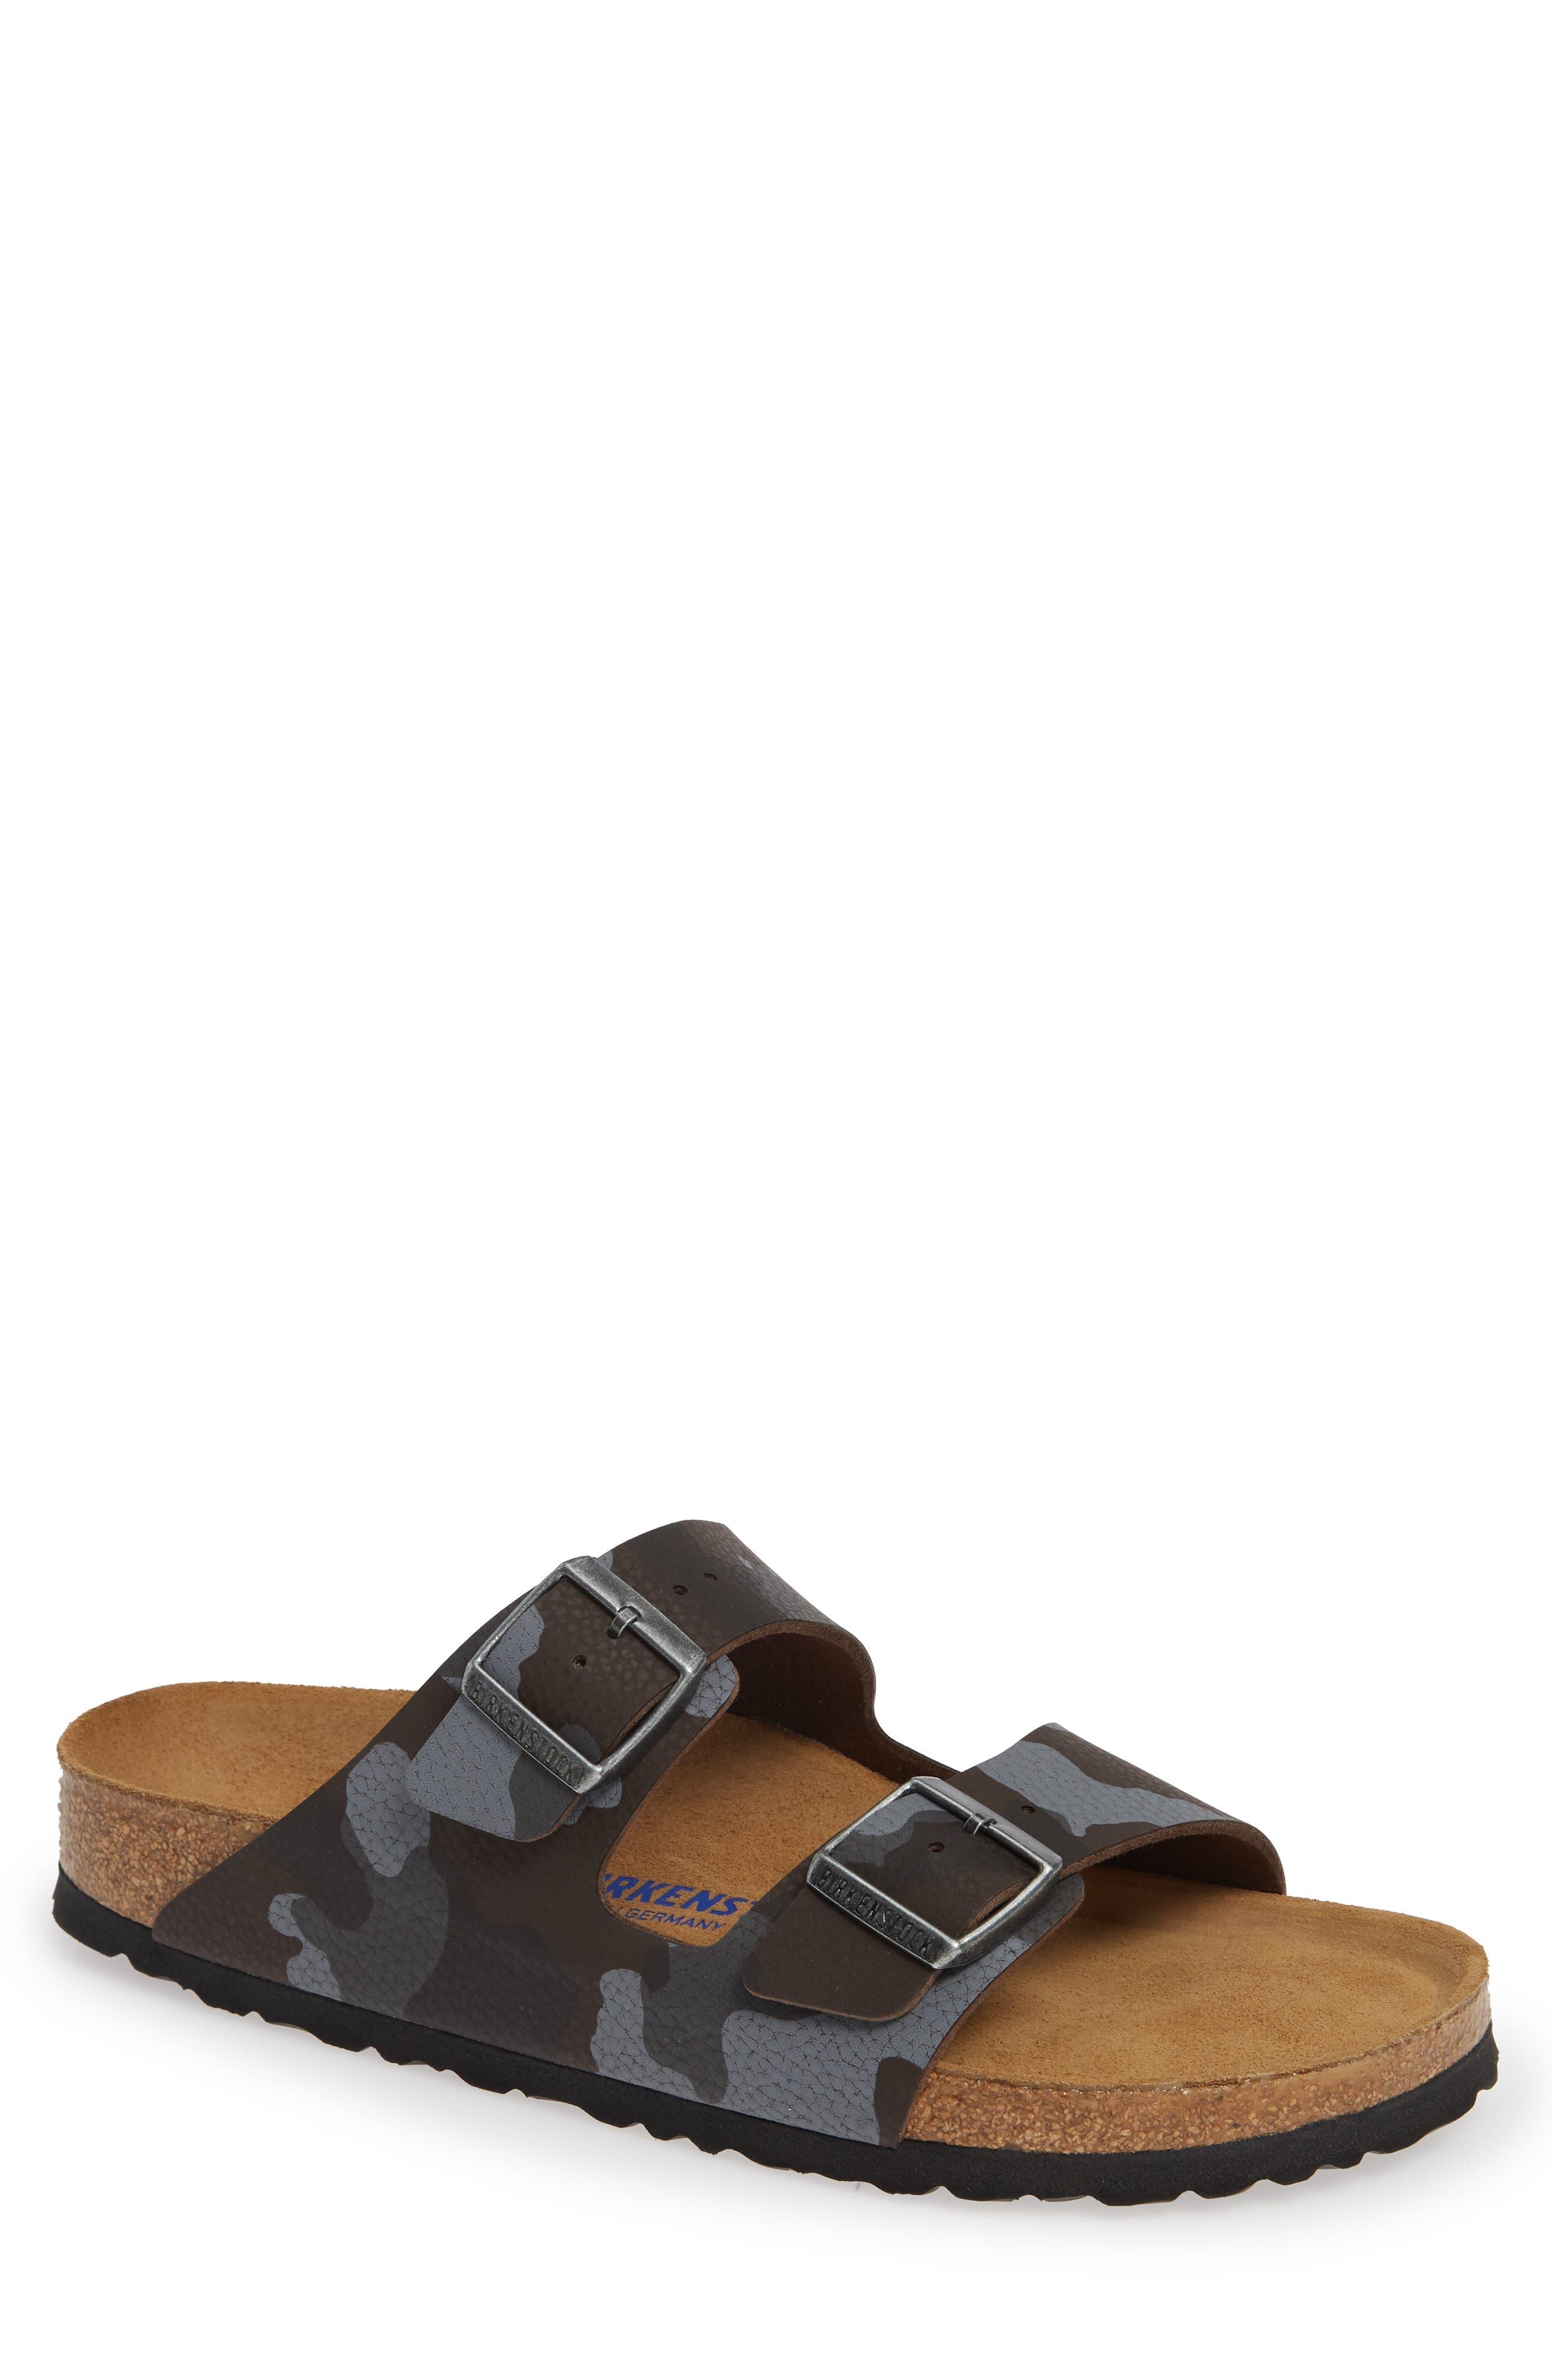 Arizona Soft Slide Sandal,                             Main thumbnail 1, color,                             DESERT SOIL CAMO BROWN